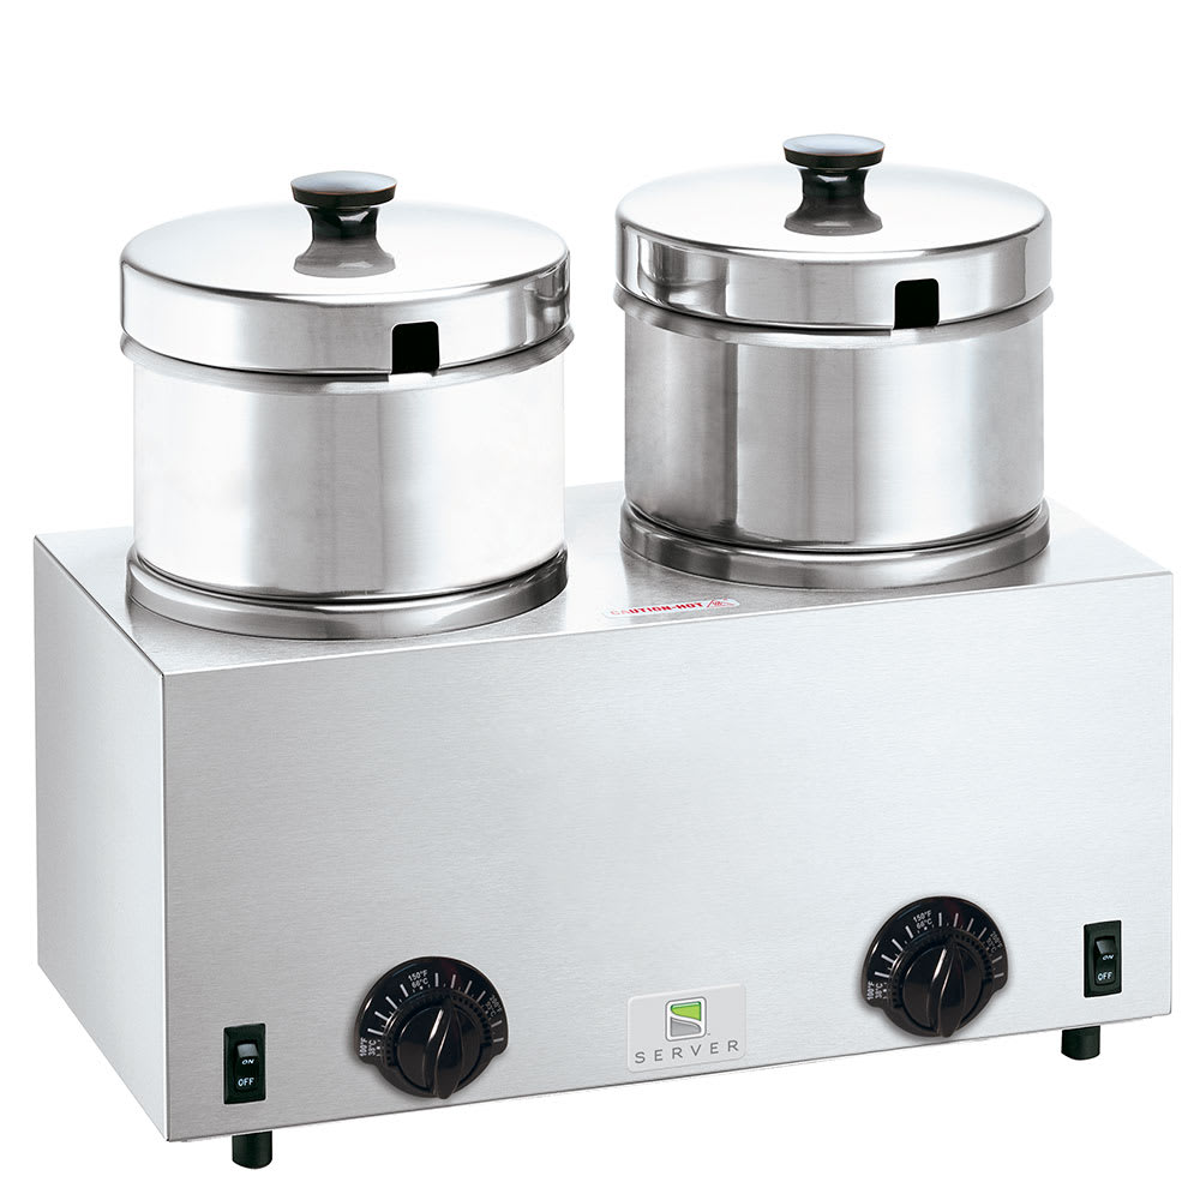 Server 81200 (2) 5-qt Countertop Soup Warmer w/ Thermostatic Controls, 120v